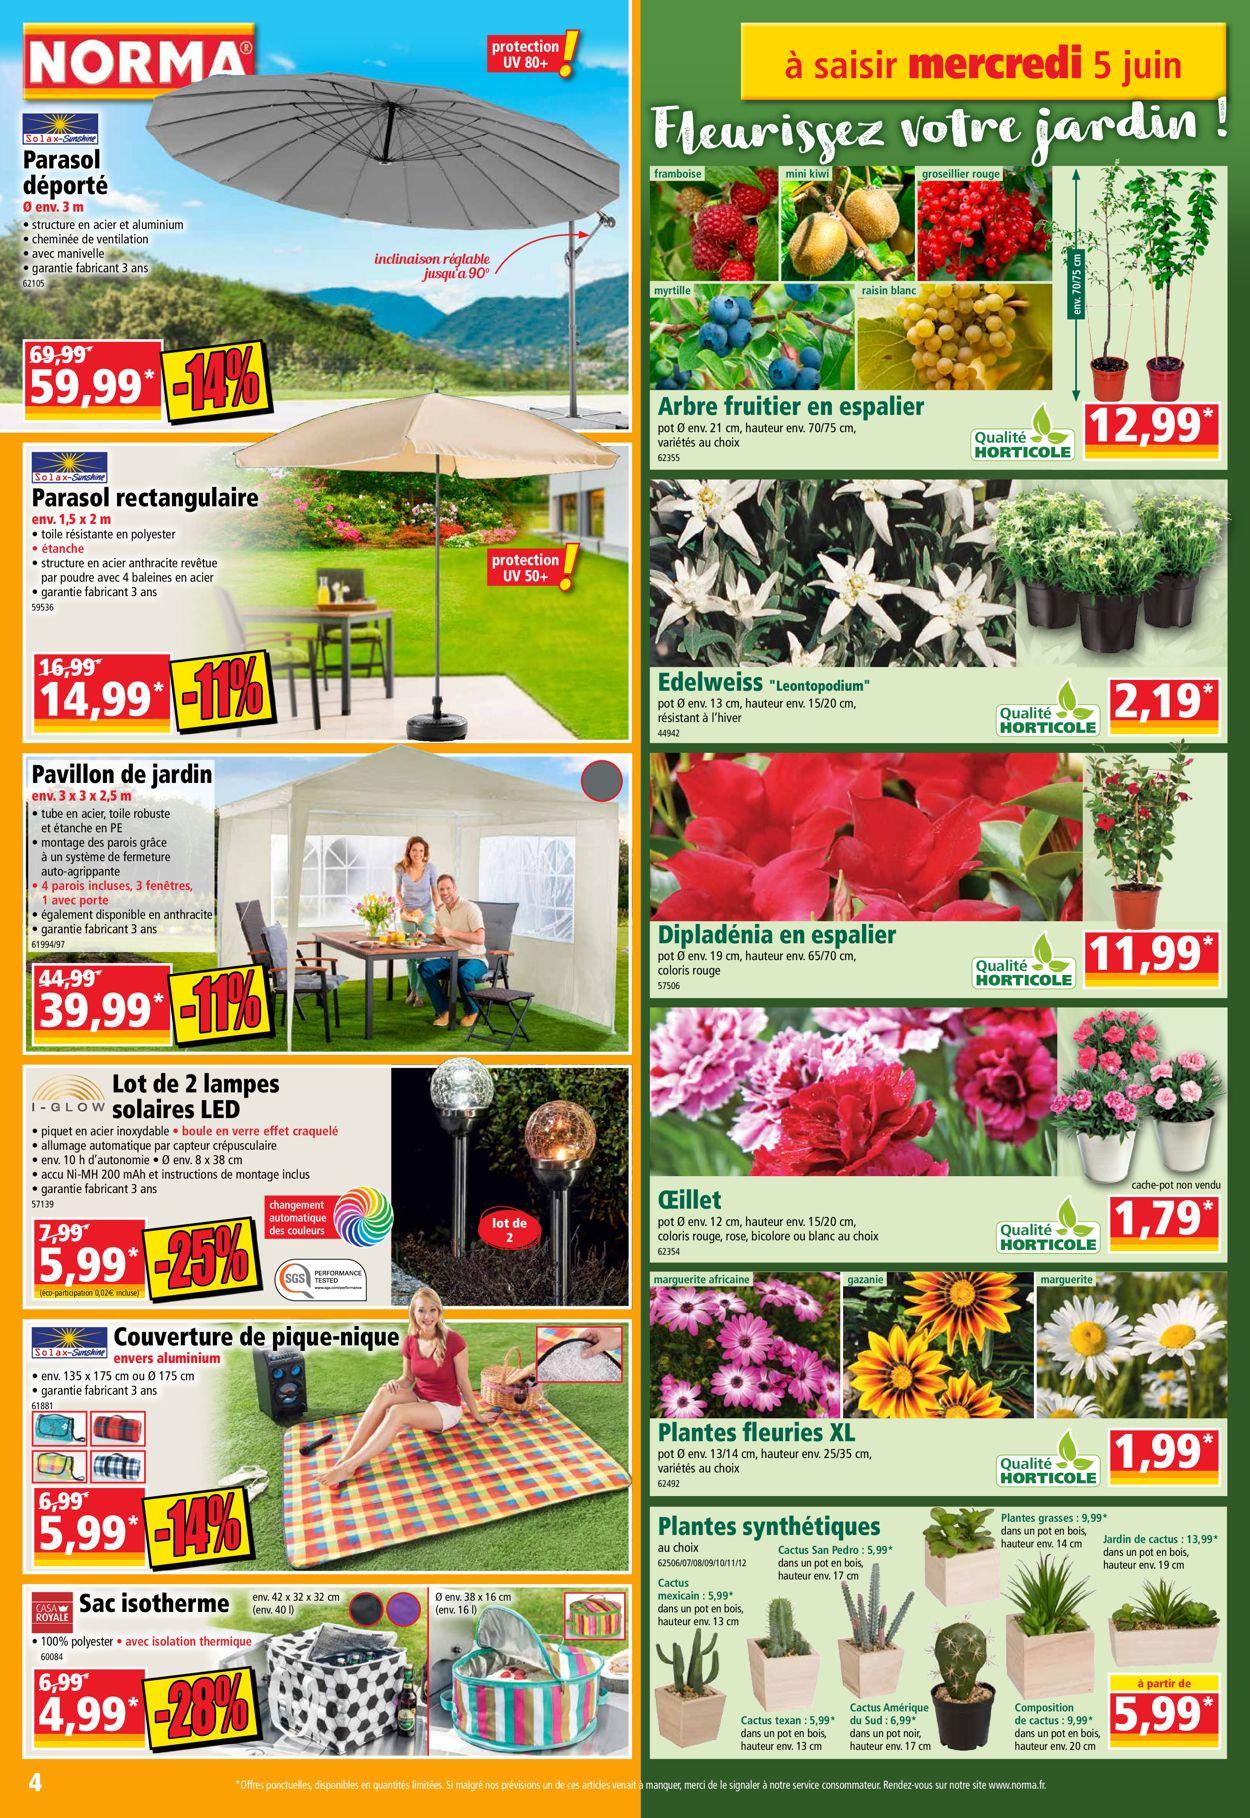 Norma Catalogue - 05.06-11.06.2019 (Page 4)